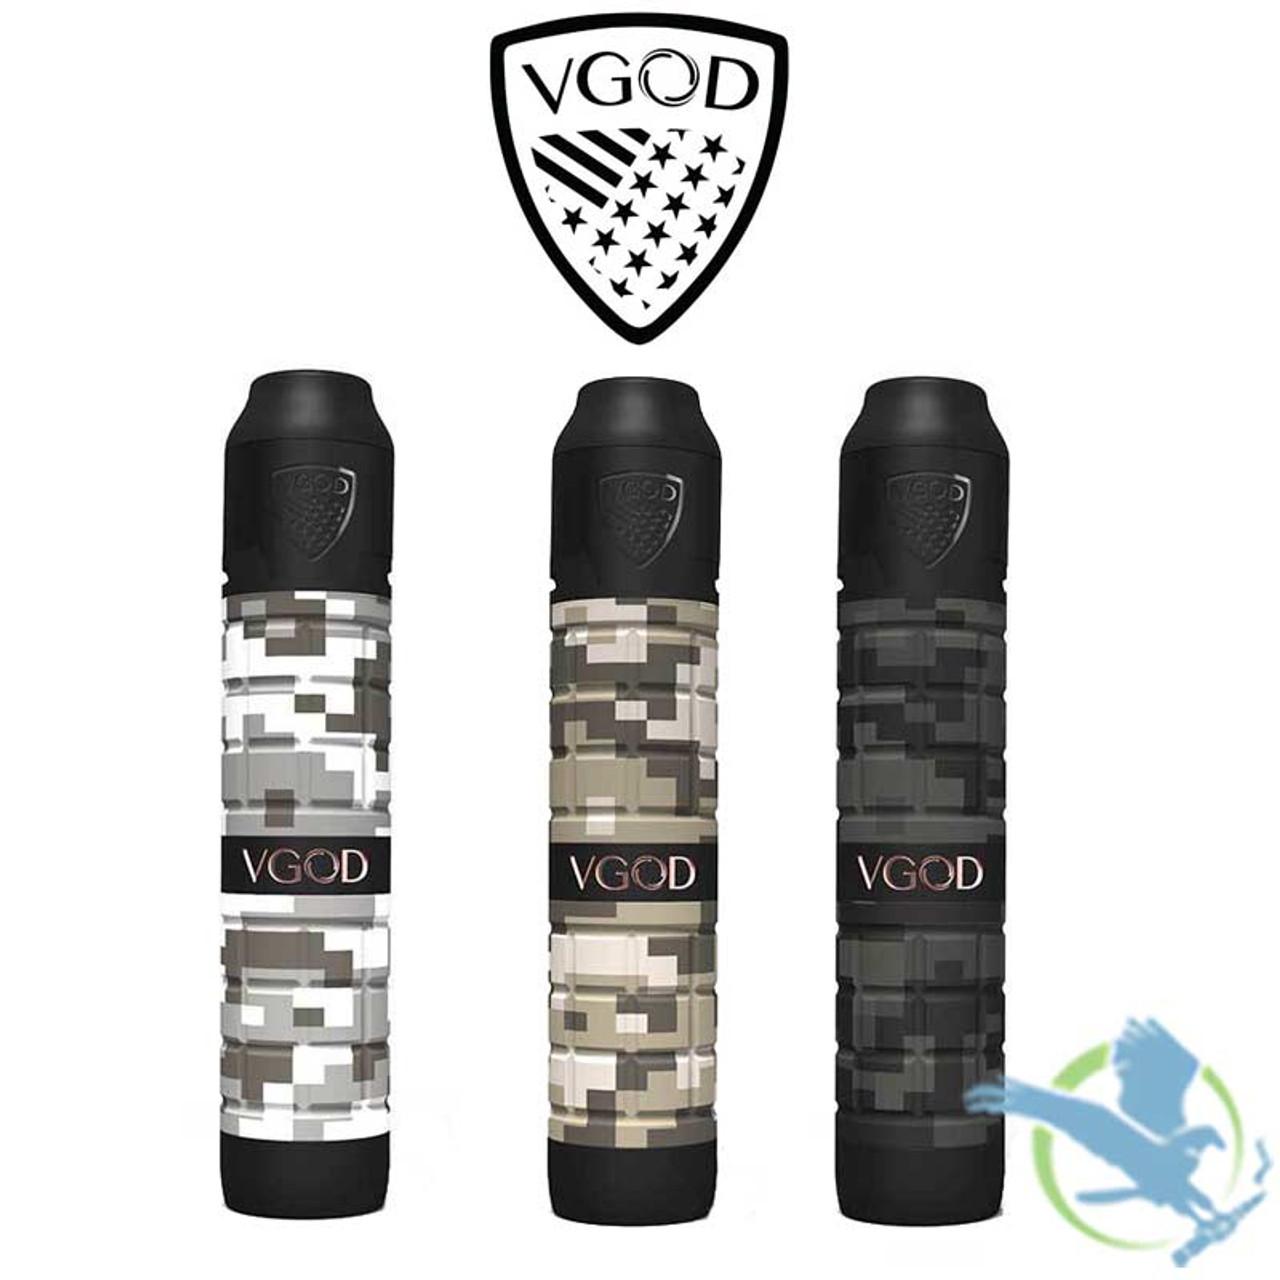 VGOD Pro Mech 2 Delrin Encased Copper Tube Mechanical Mod Kit With 2ML  Elite RDA - Camo Series (MSRP $100 00)